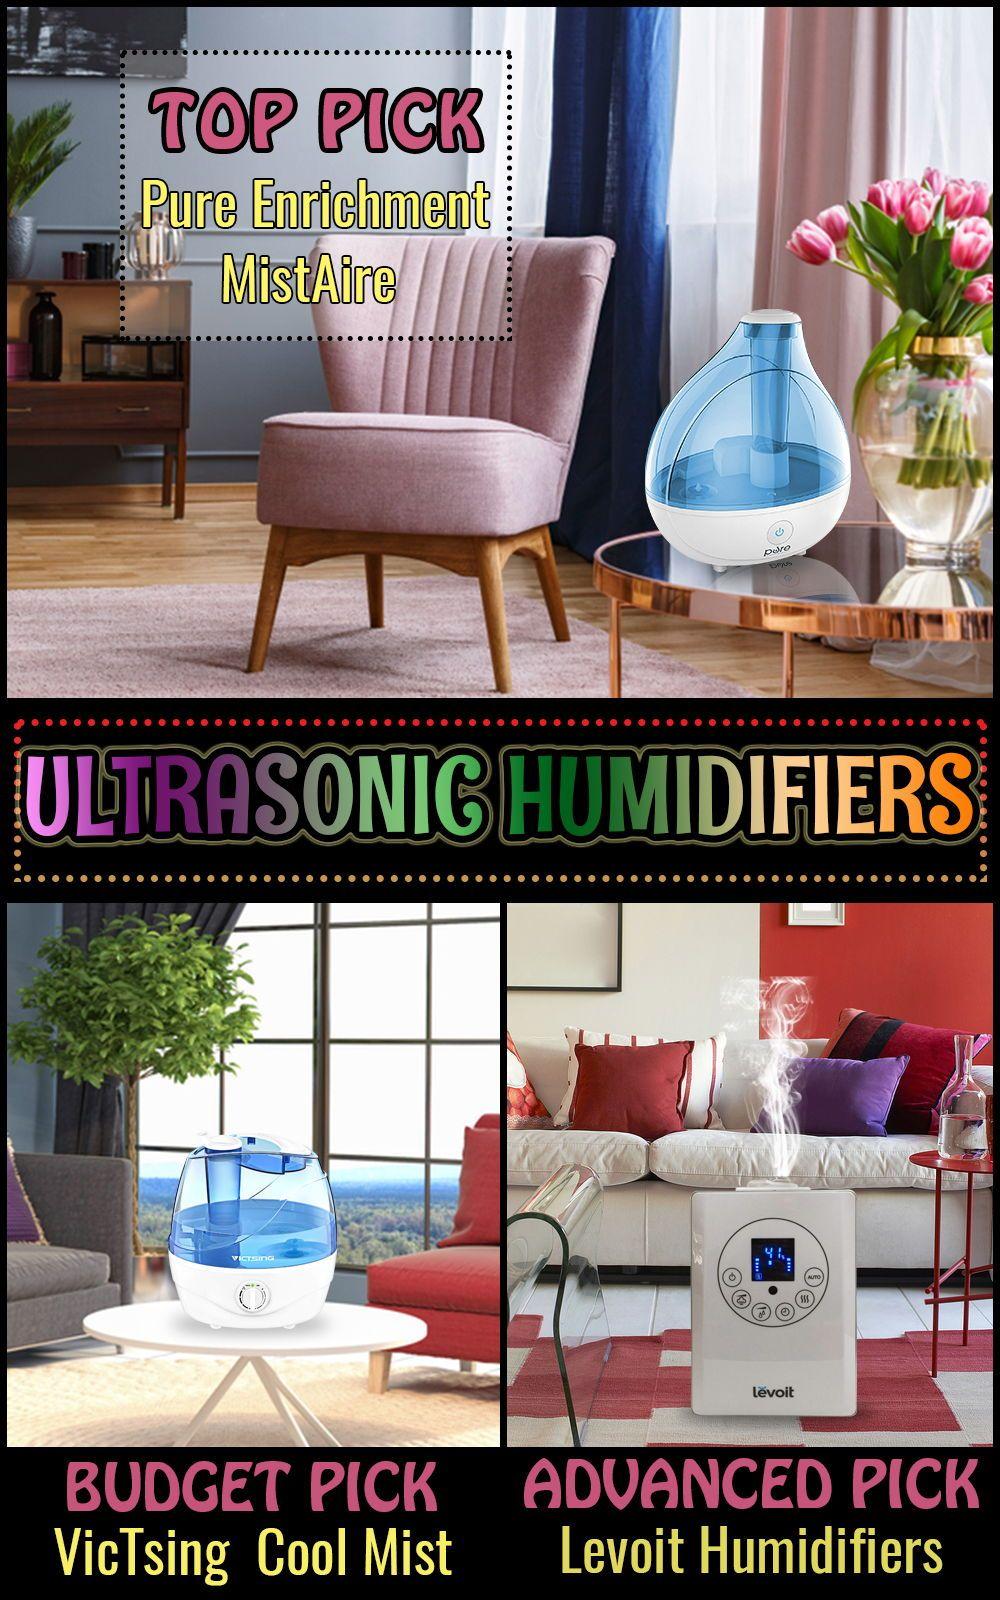 Top 10 Ultrasonic Humidifiers (Dec. 2019) Reviews